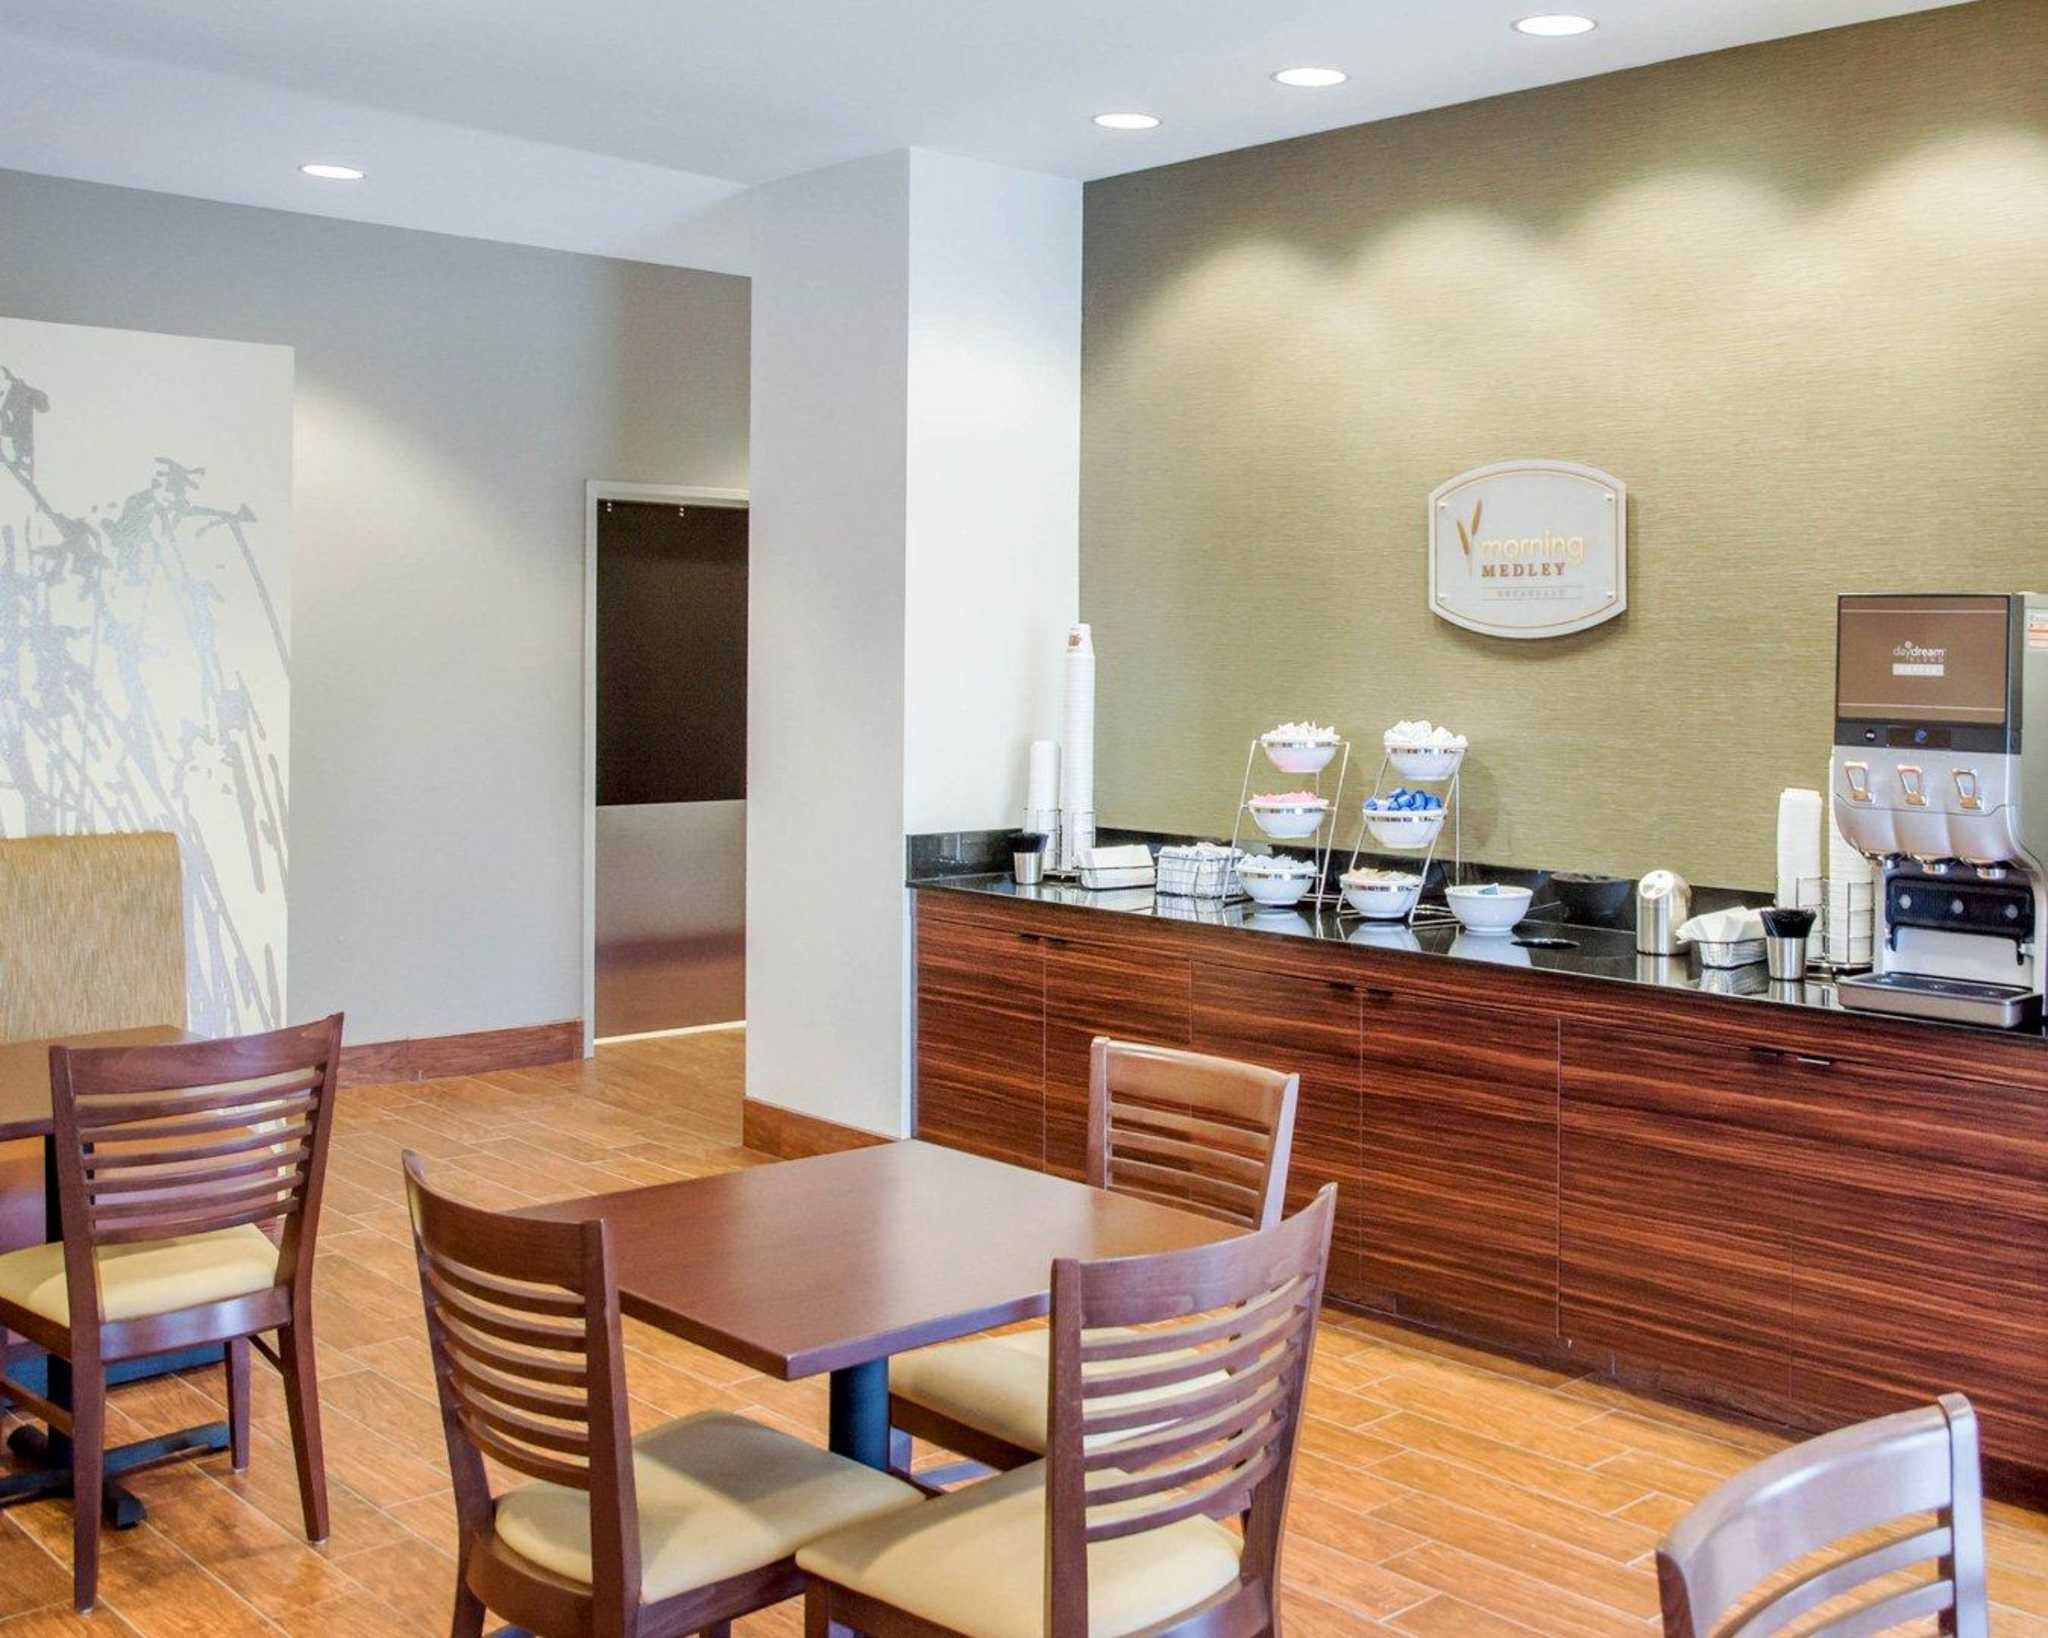 Sleep Inn & Suites Parkersburg-Marietta image 11